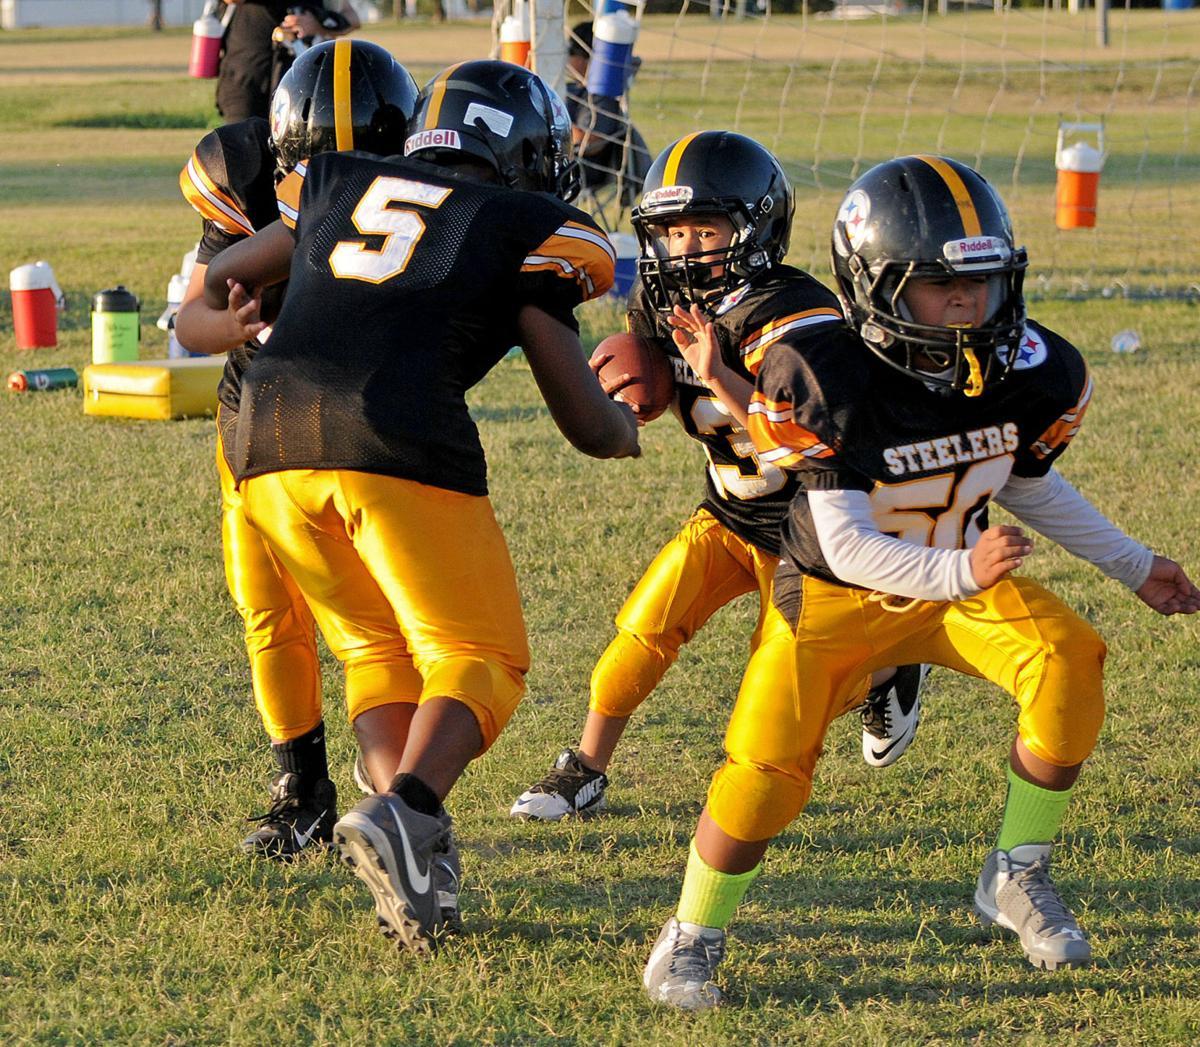 b403af4ce Seguin Steelers youth football | Multimedia | seguingazette.com